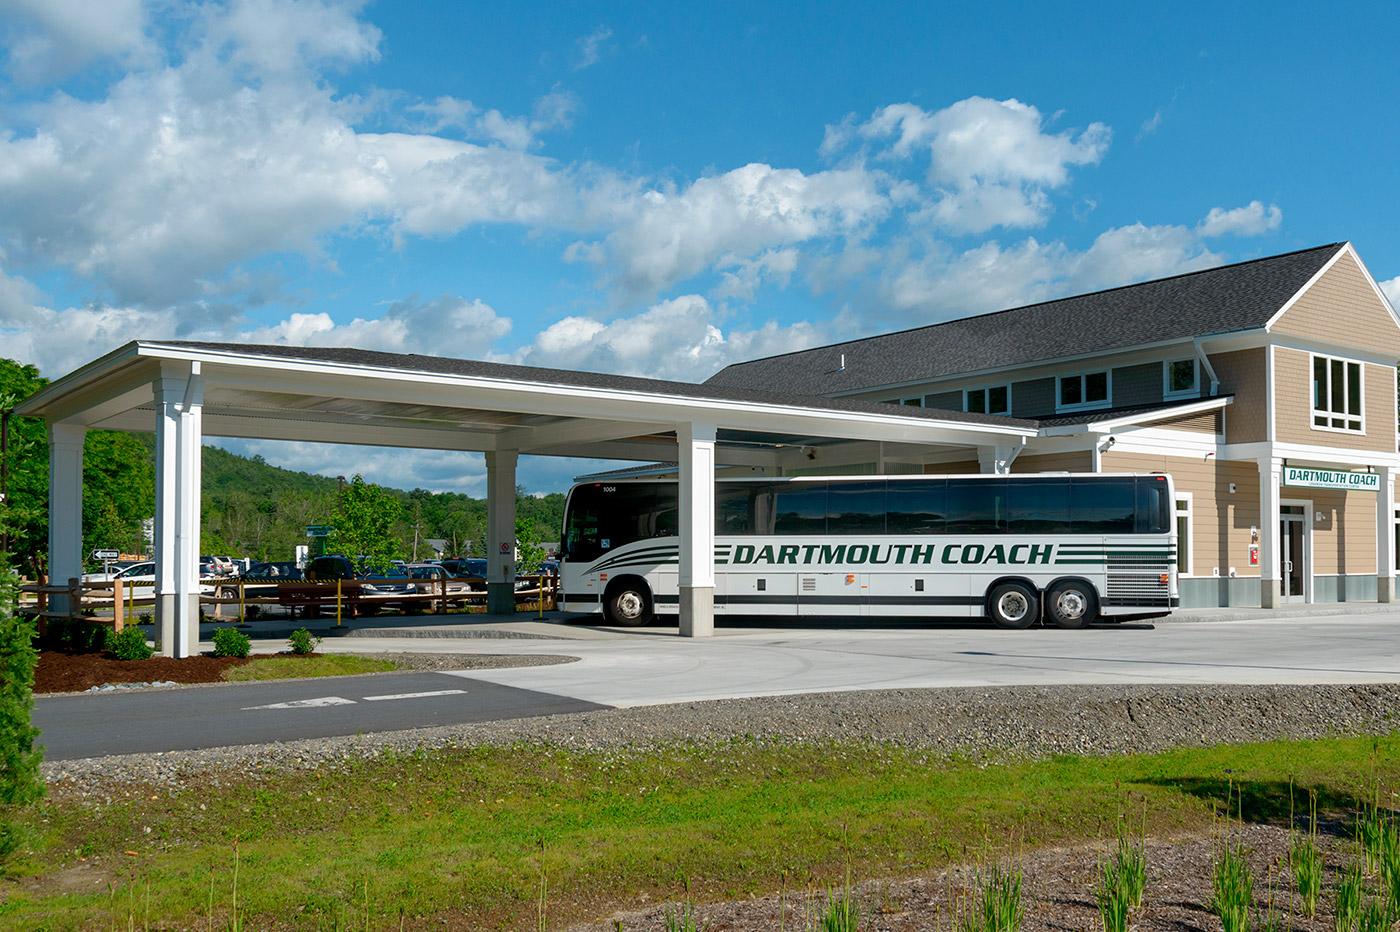 sheldon pennoyer architects - transportation terminal, dartmouth